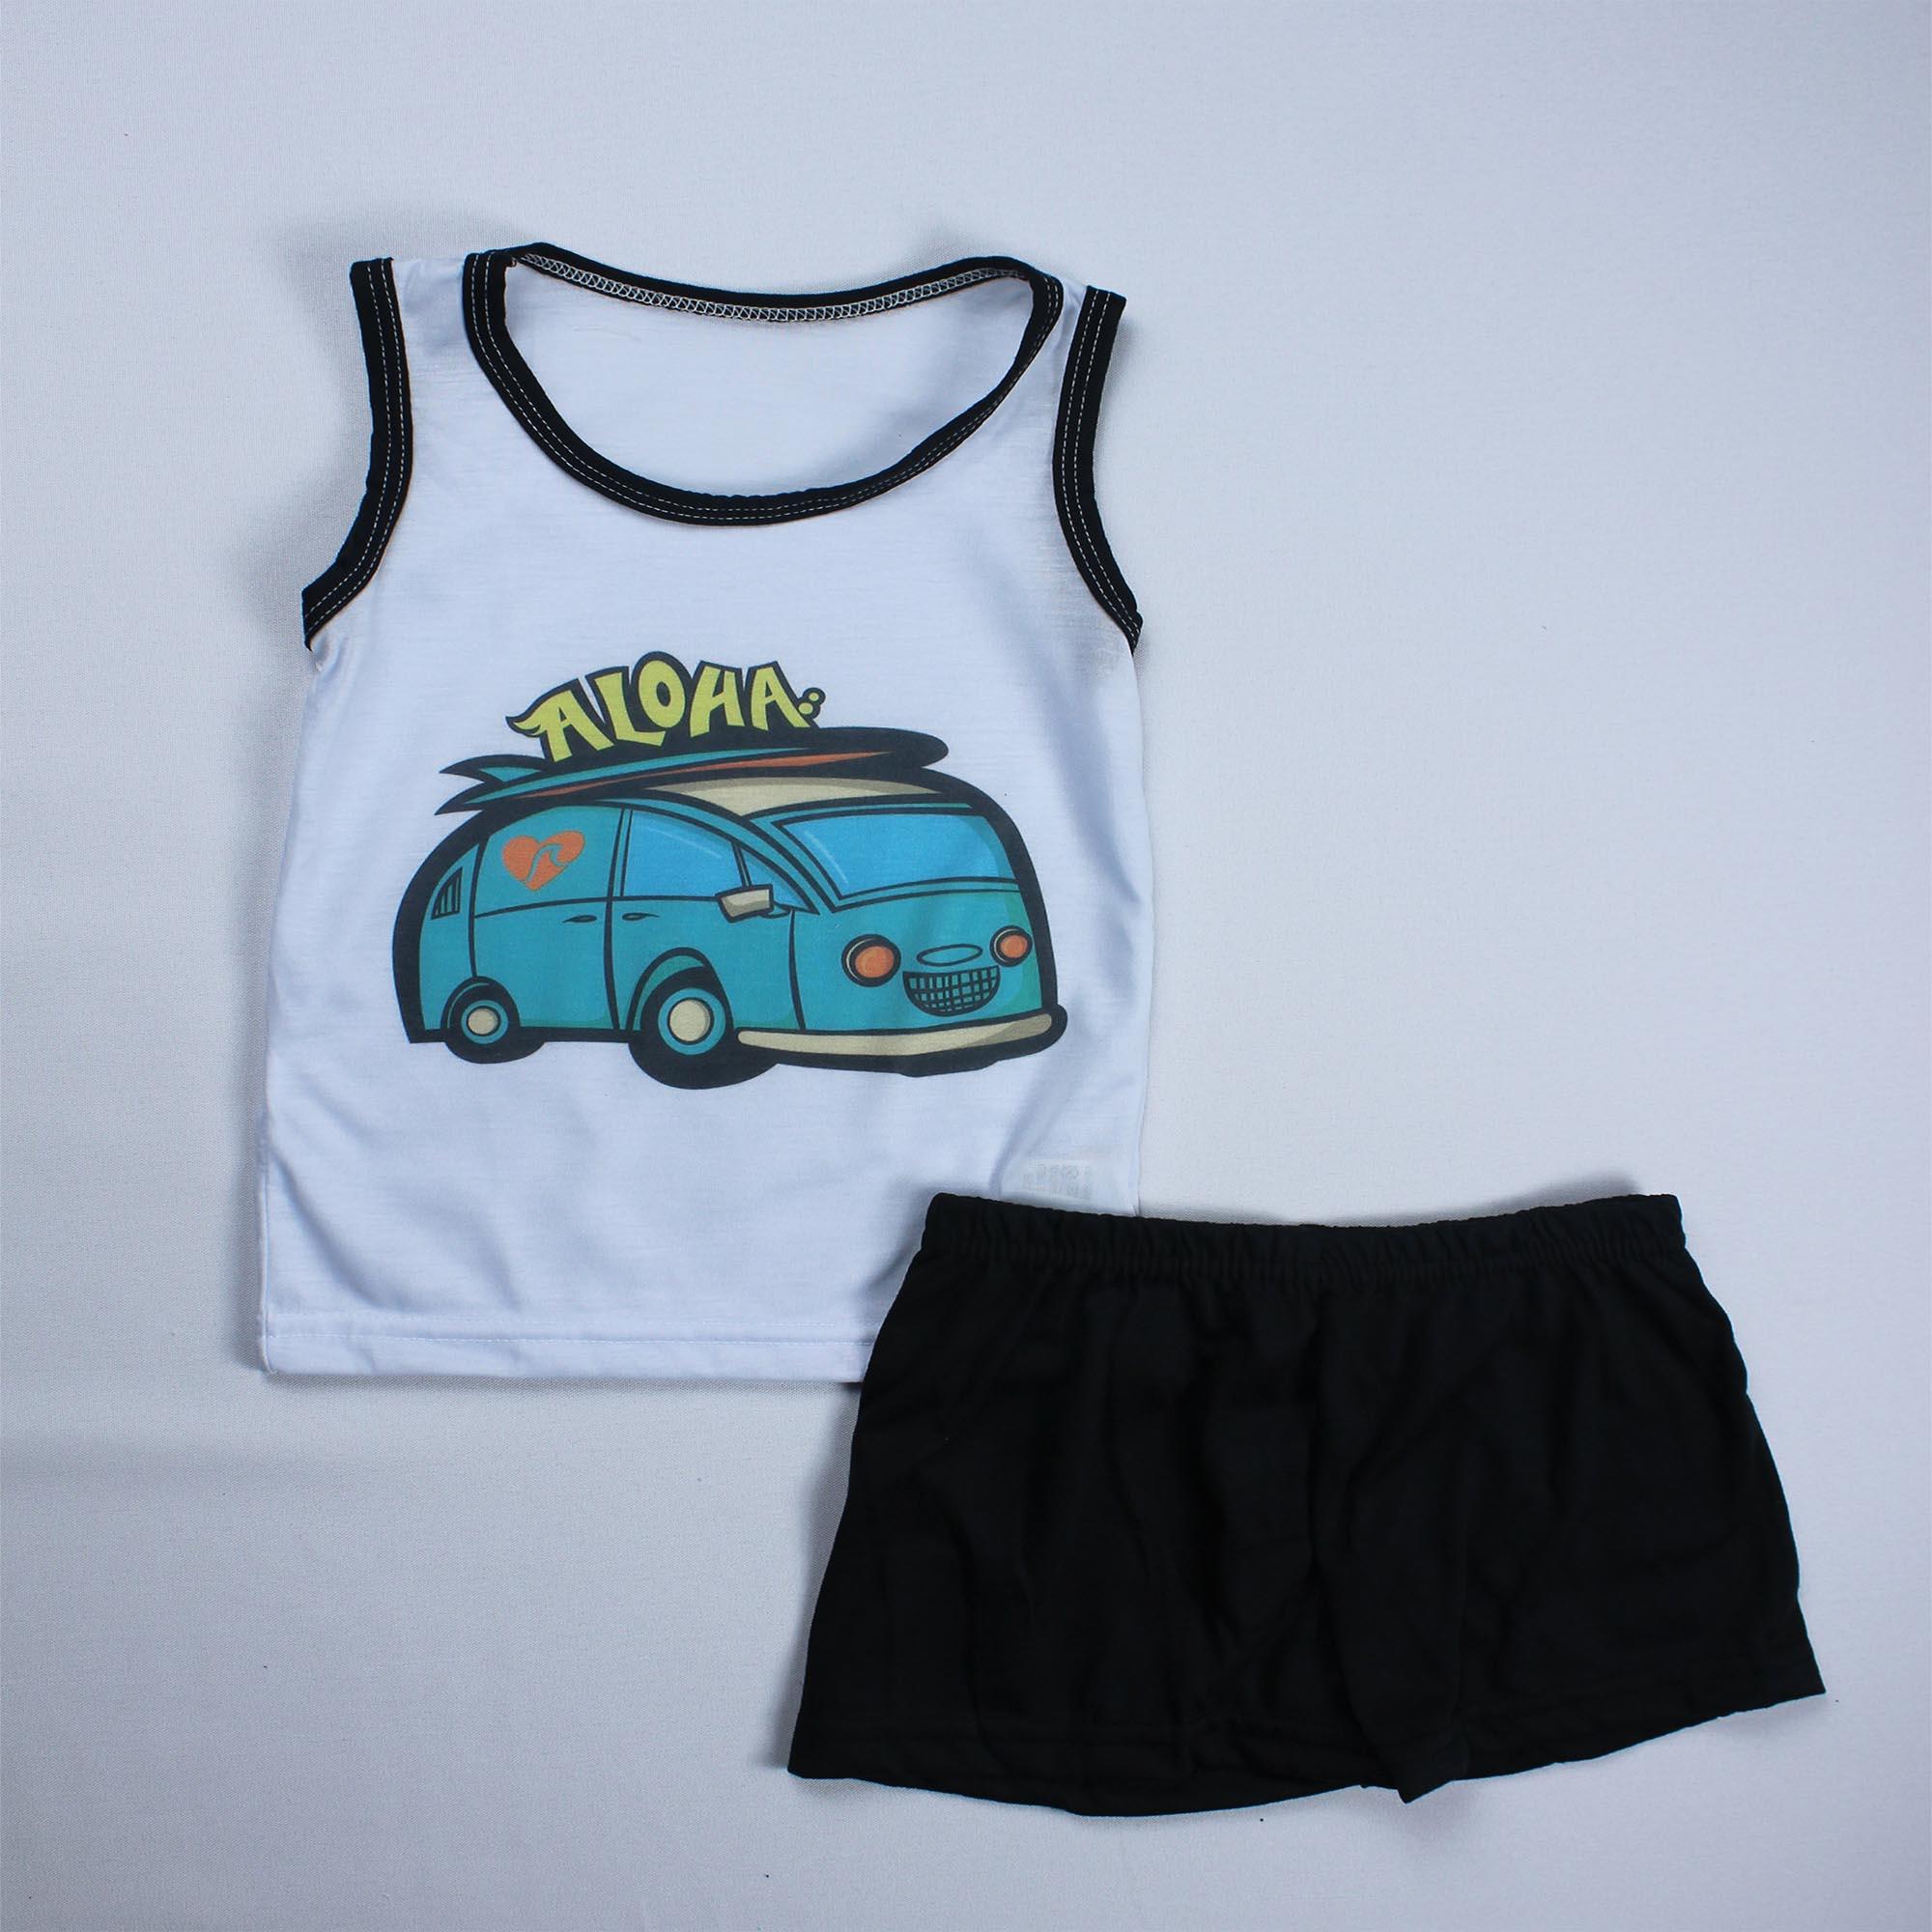 Pijama Regata Infantil Menino - Tamanho 4